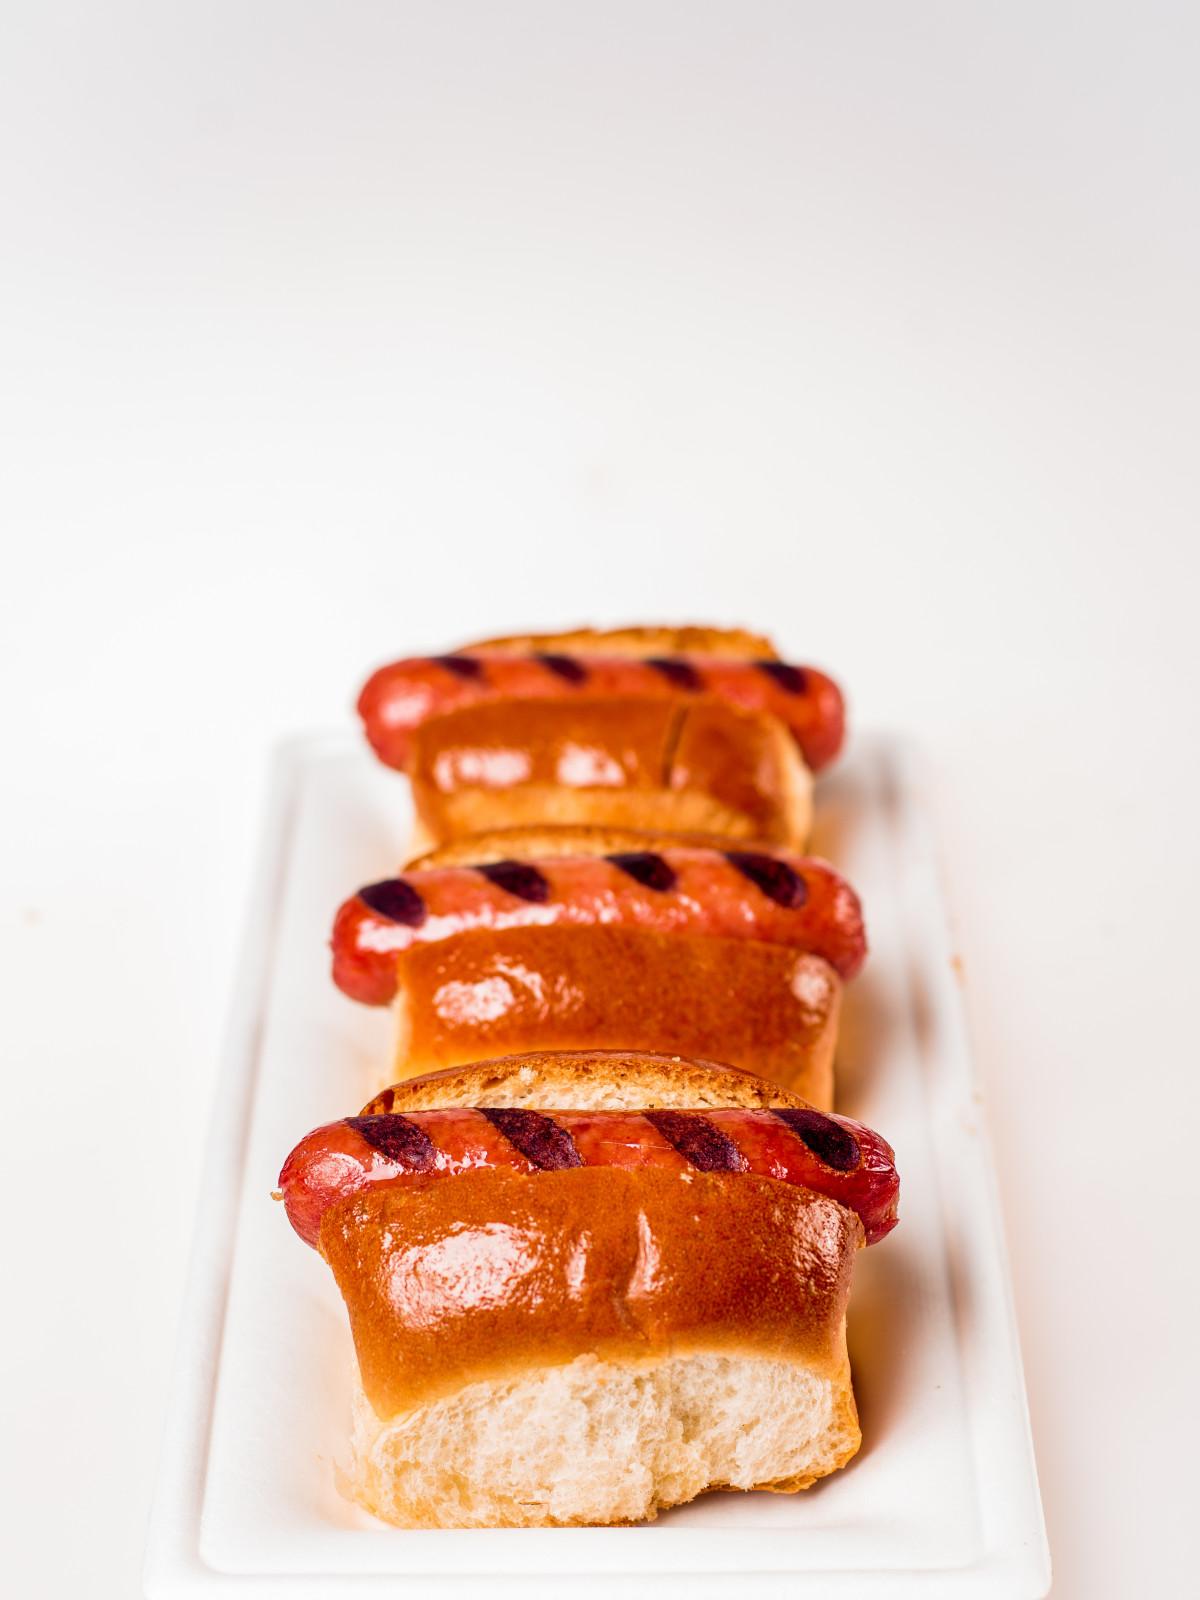 Astros Hot Dog Sliders